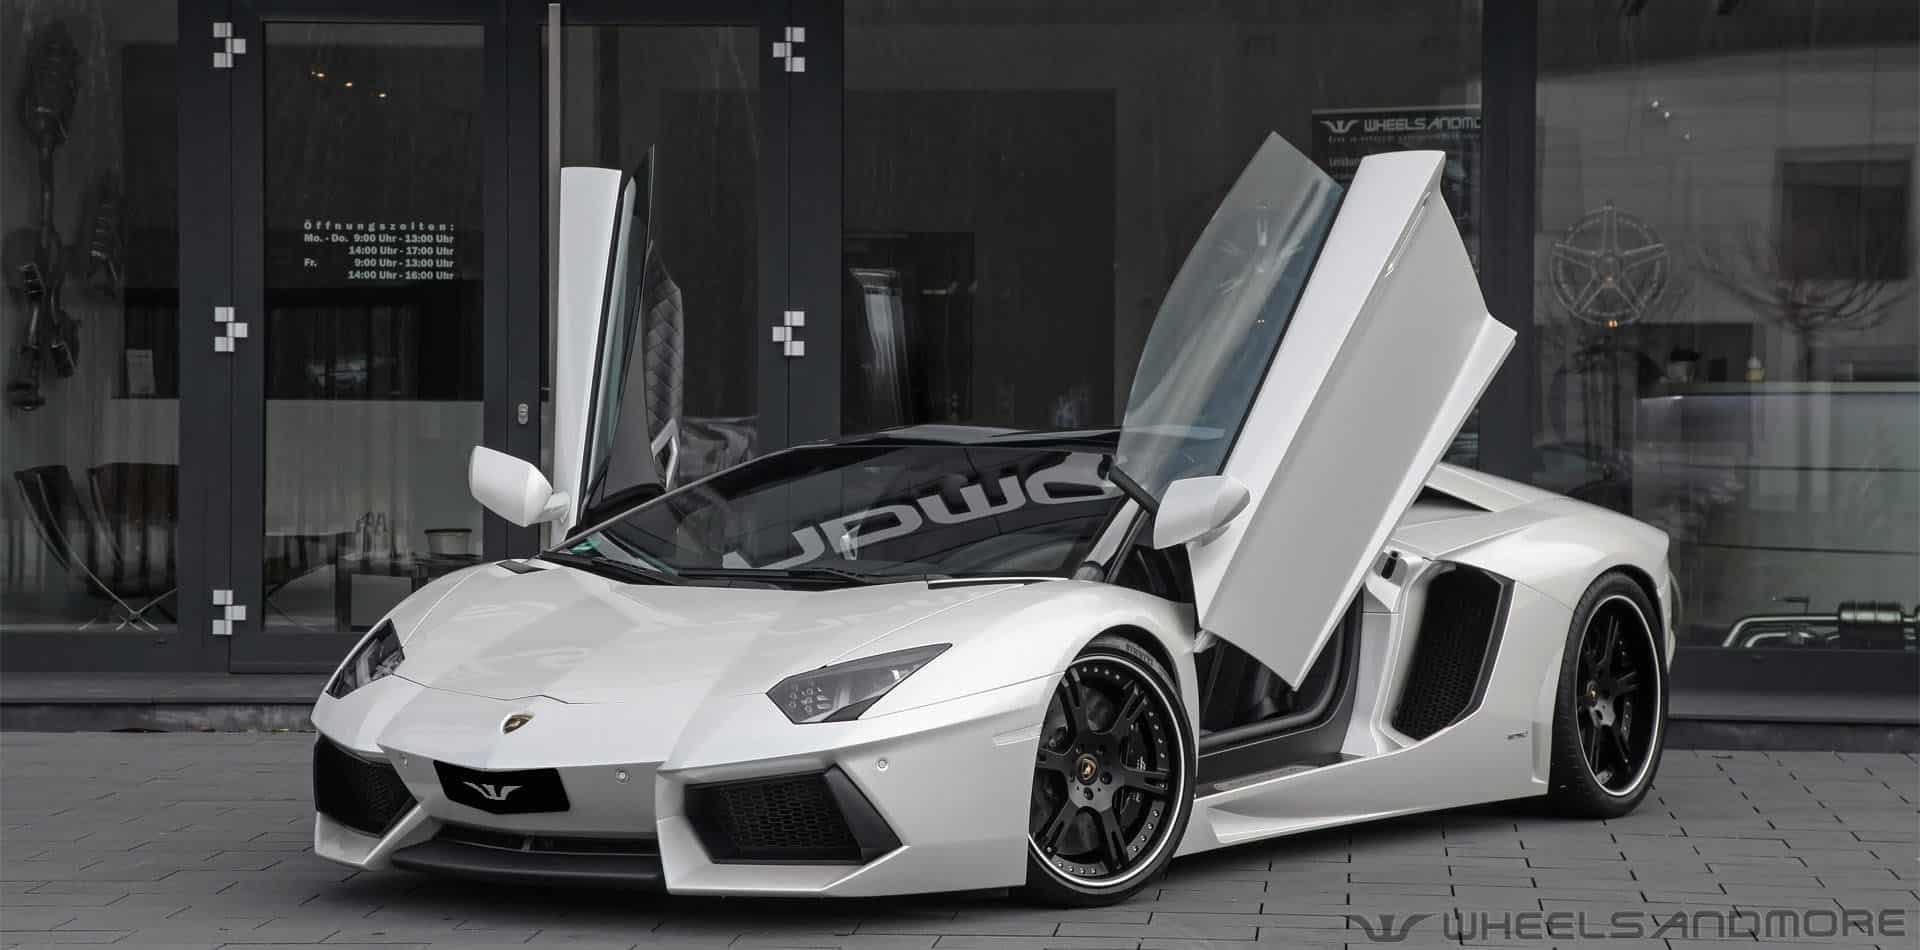 Lamborghini Aventador Wheels Exhaust And Tuning Wheelsandmore Wheelsandmore Tuning